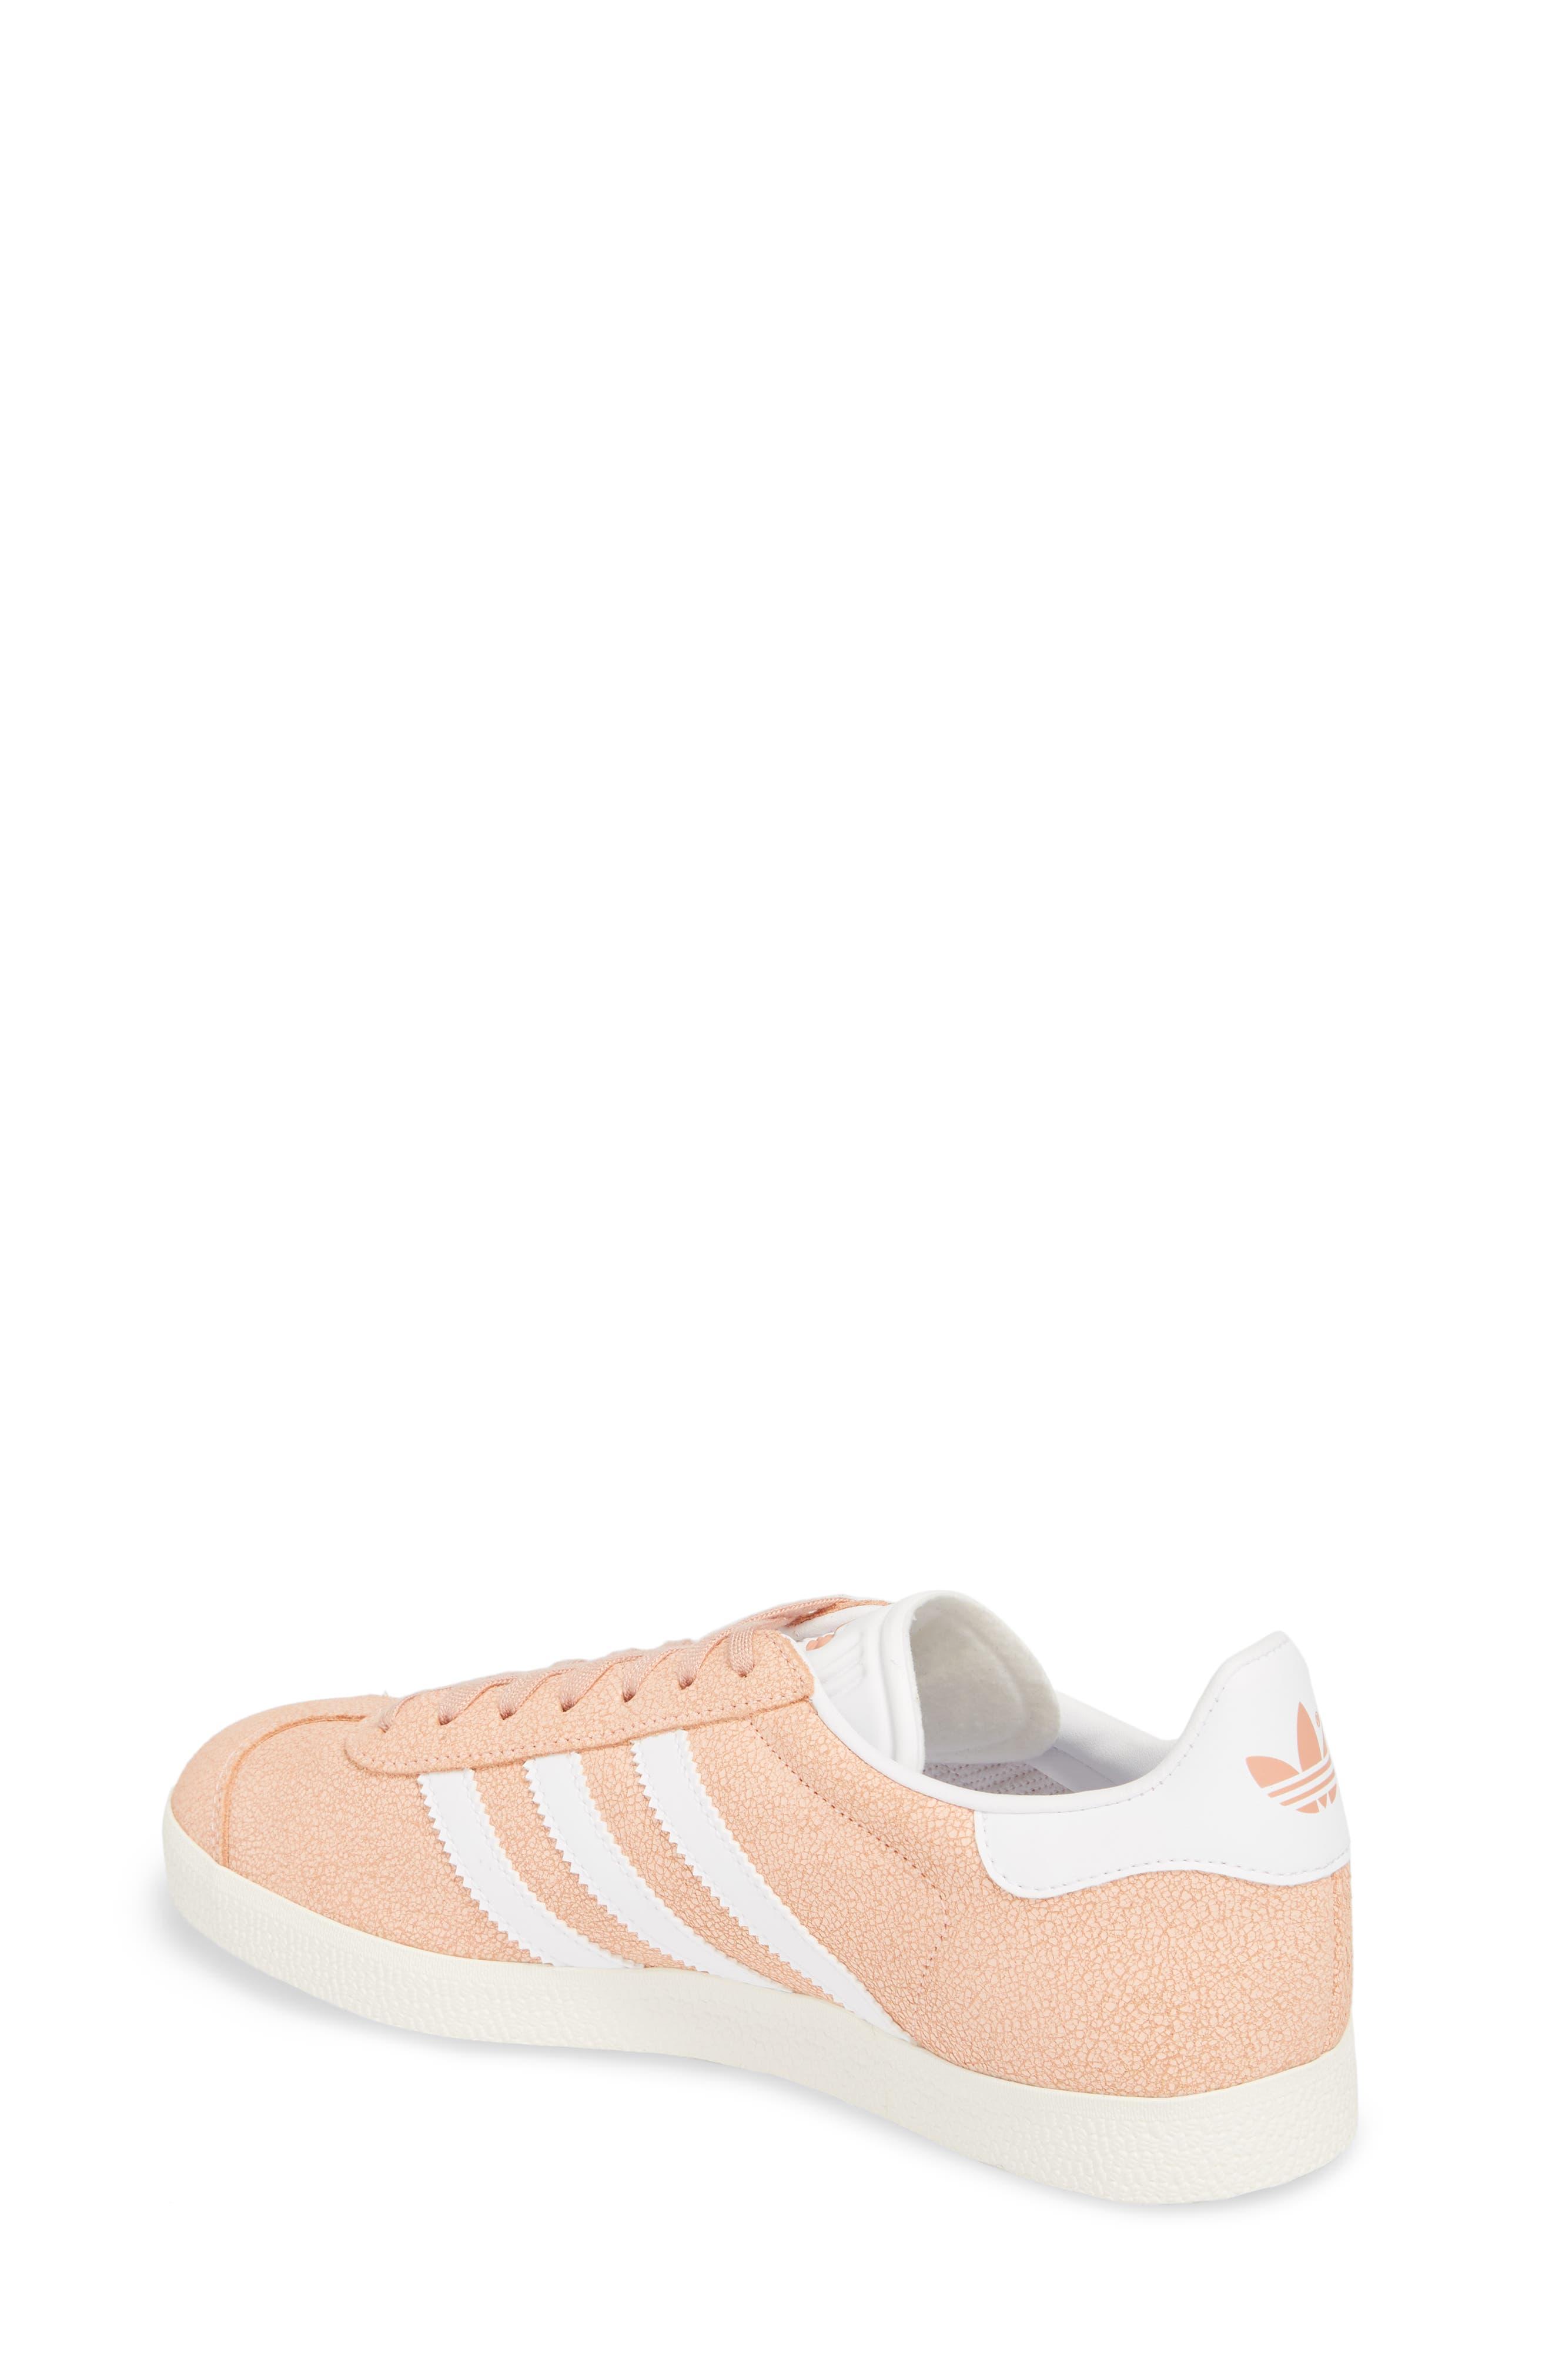 Gazelle Sneaker,                             Alternate thumbnail 2, color,                             Clear Orange/ White/ Off White